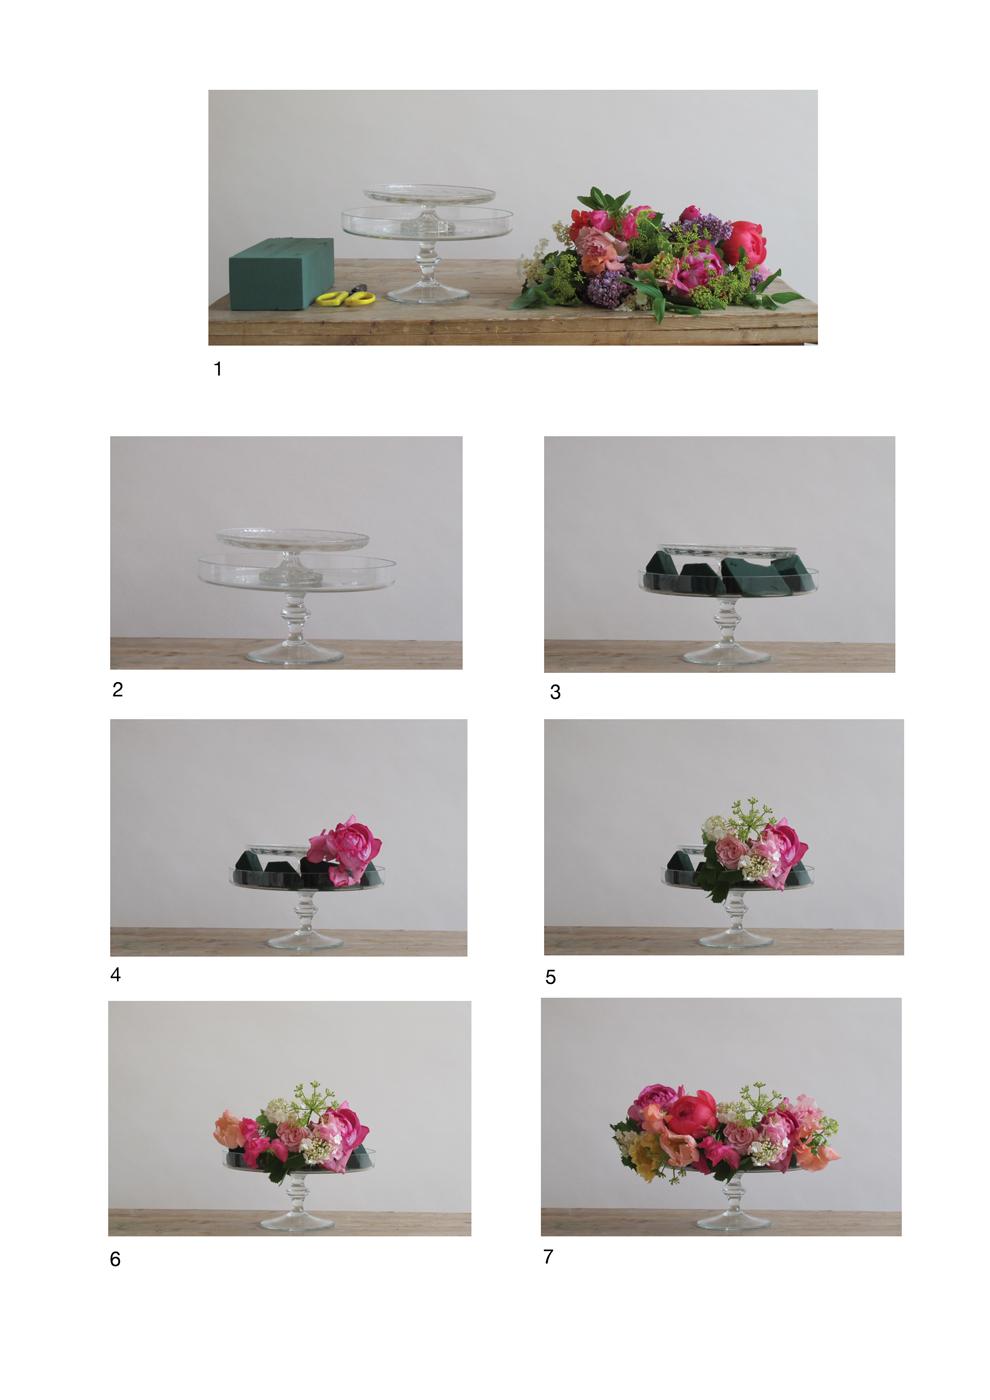 cakestandflowers1